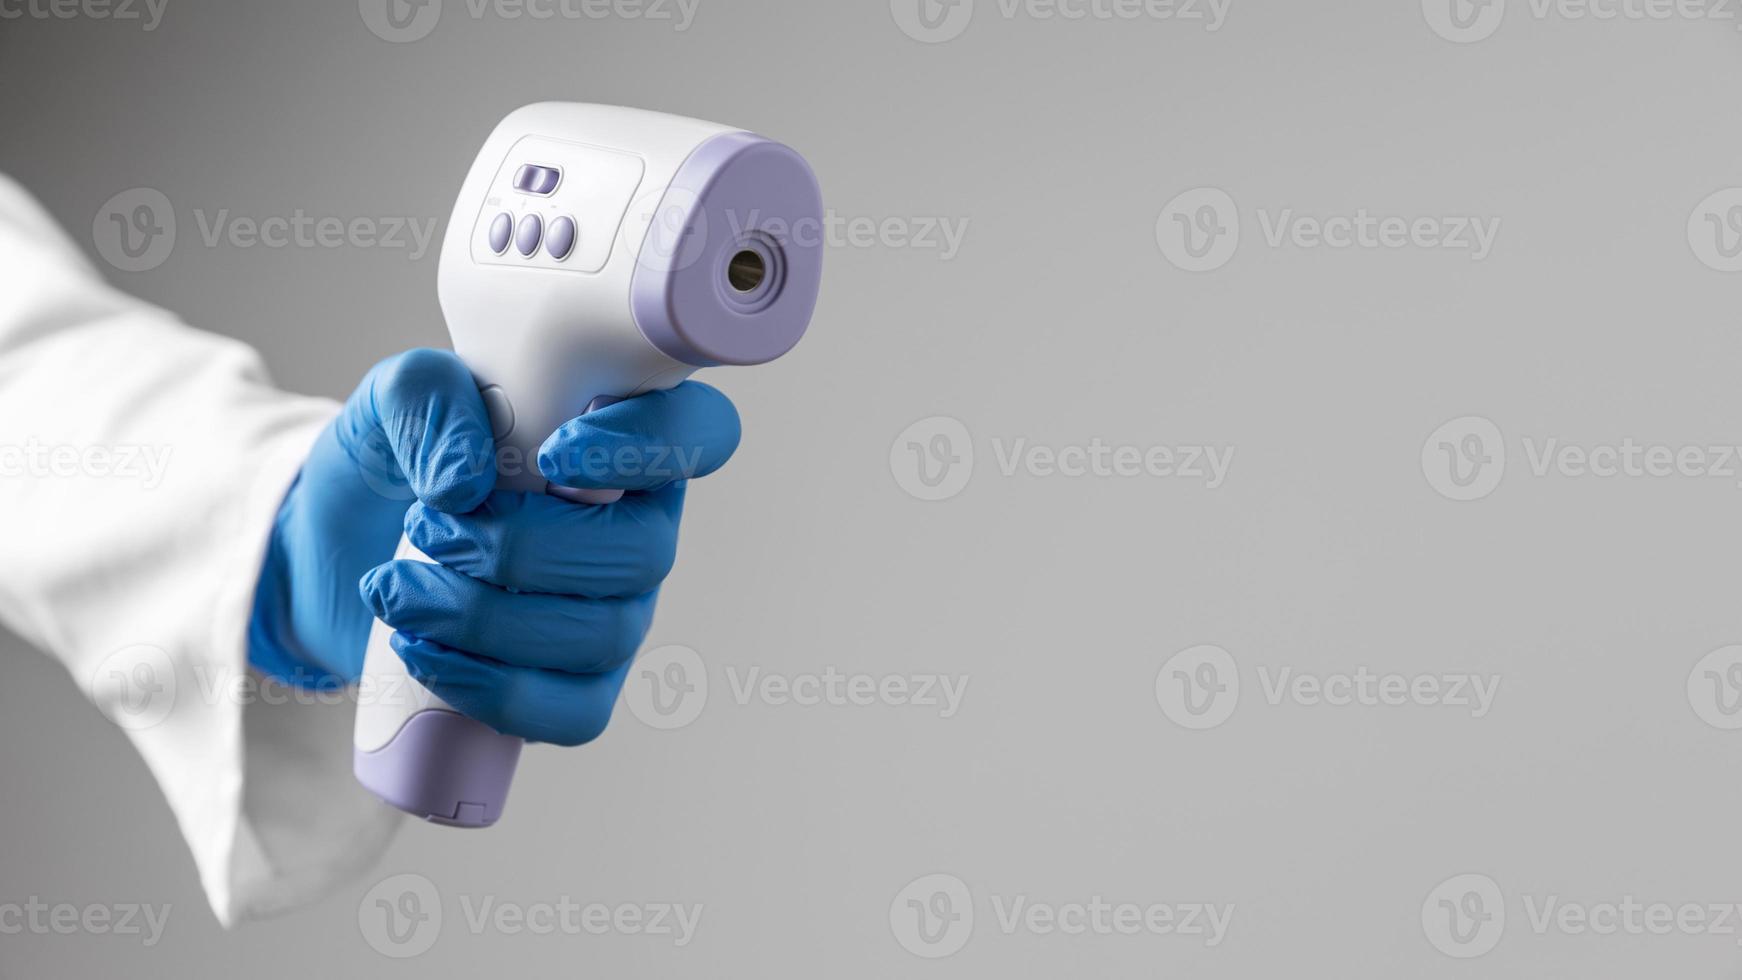 médico de luvas segura termômetro com espaço de cópia foto